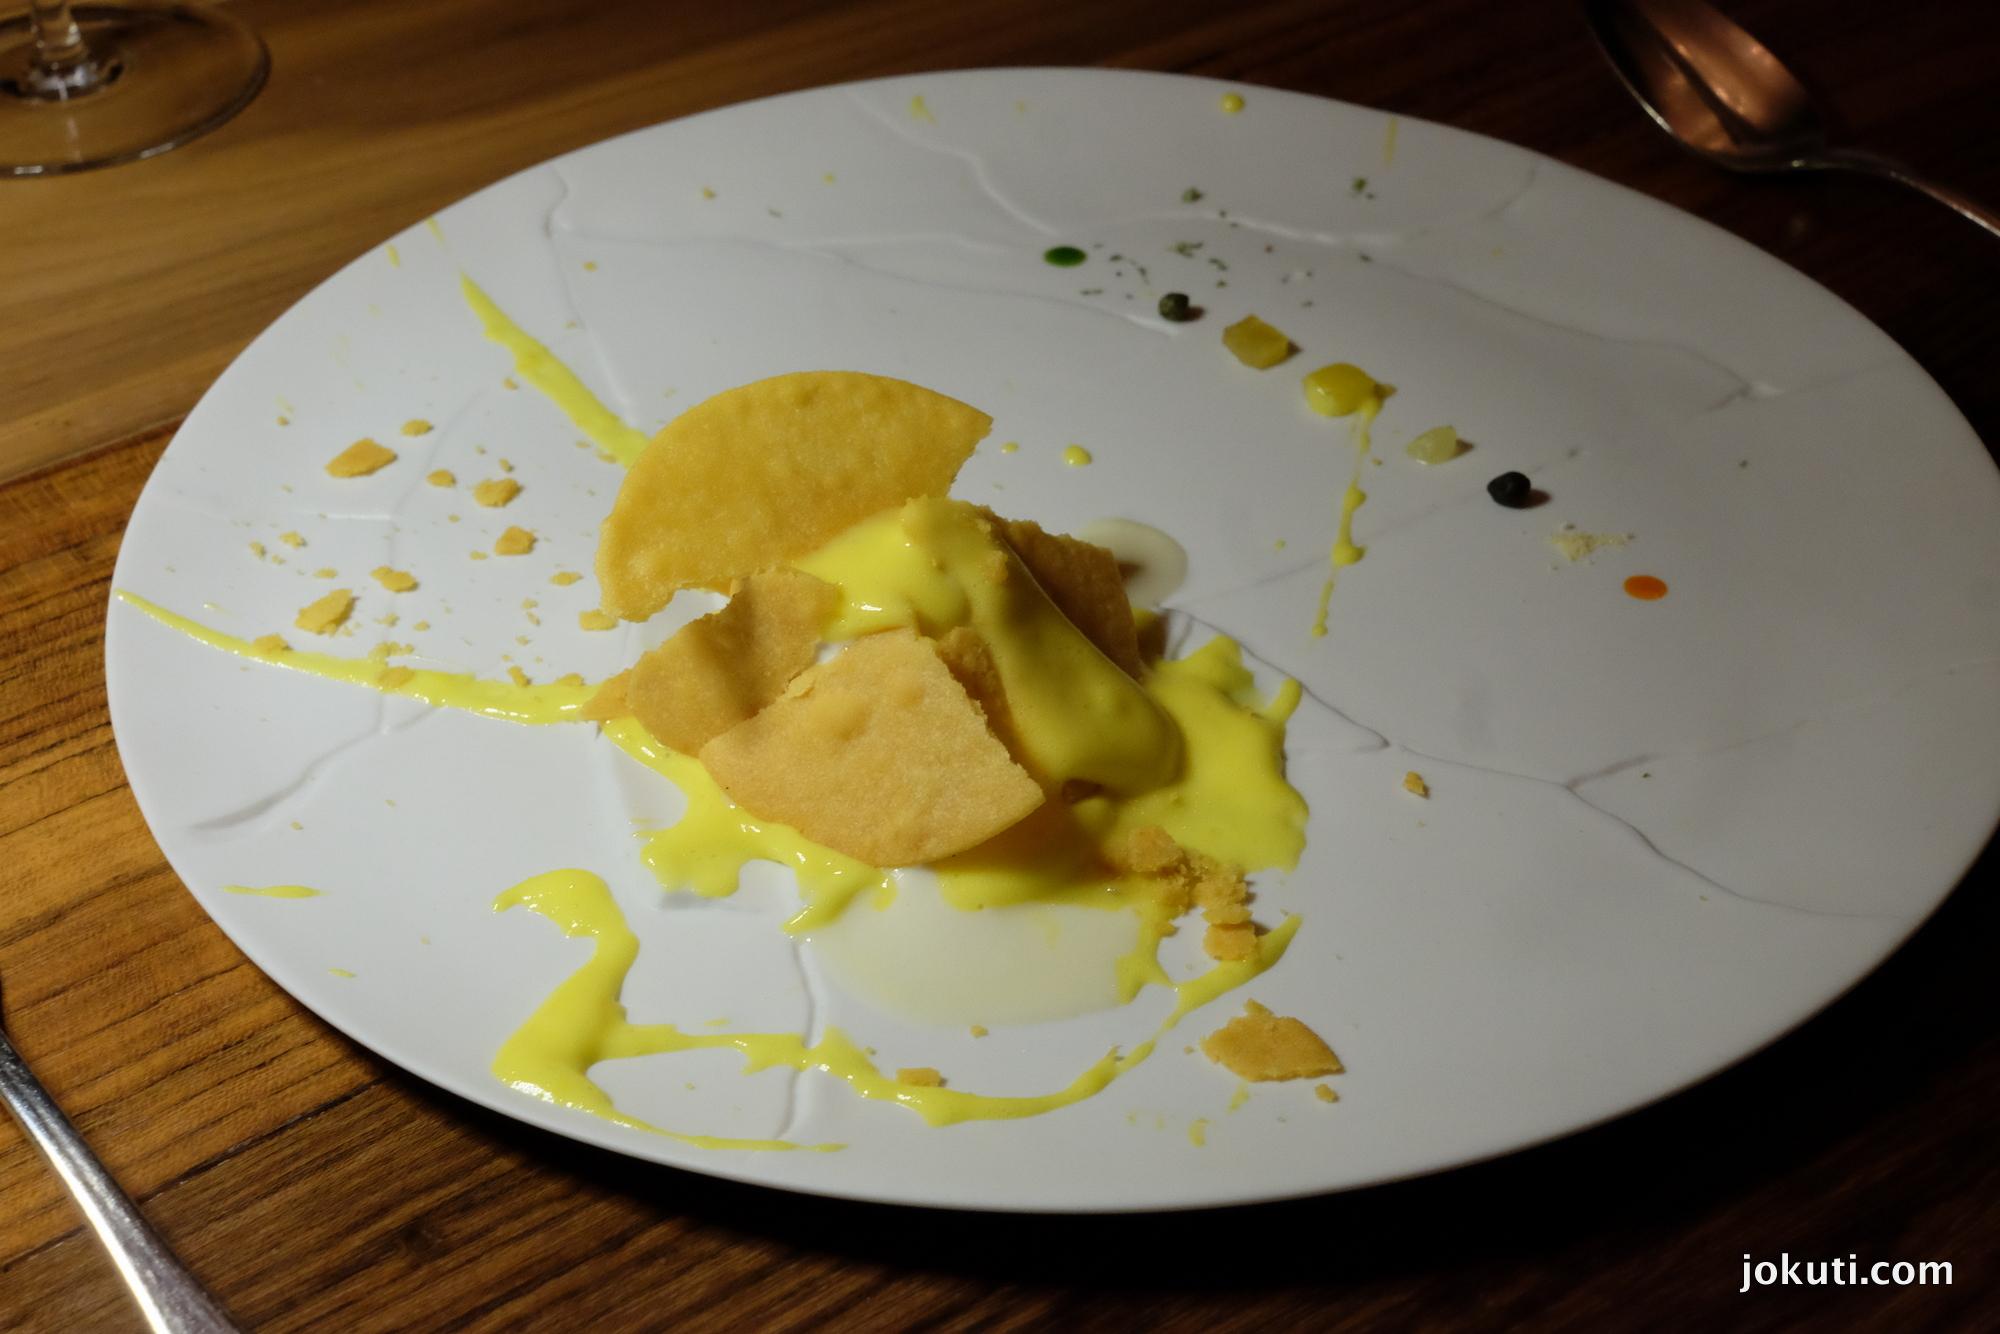 dscf5471_osteria_francescana_modena_italy_massimo_bottura_michelin_reitbauer_restaurant_vilagevo_jokuti.jpg